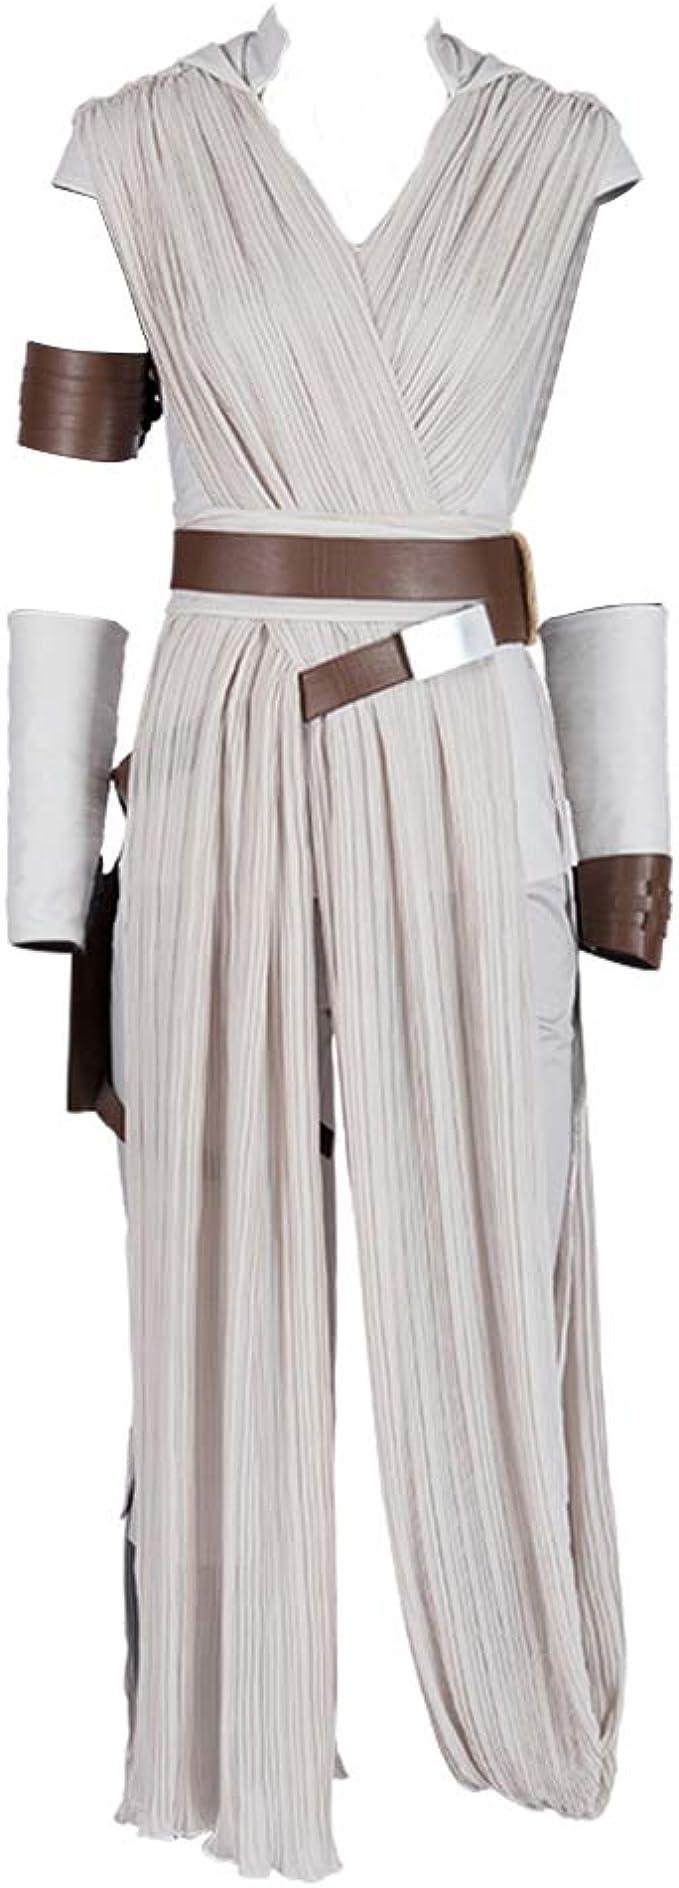 COMShow Star Wars 9 The Rise of Skywalker Rey Disfraz de Cosplay ...